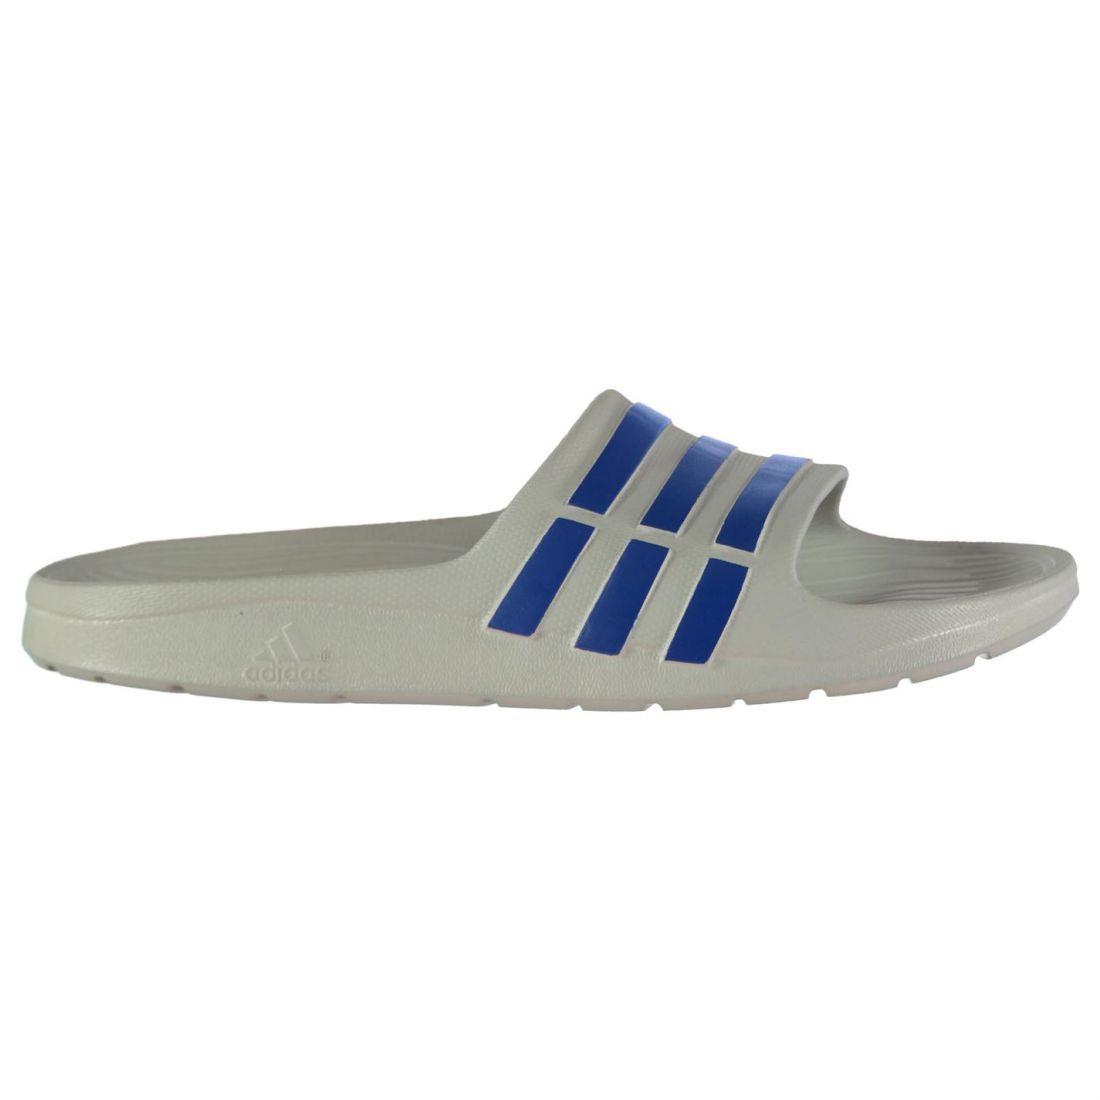 on sale ea0be f0d98 Image is loading adidas-Kids-Boys-Duramo-Slide-Pool-Shoes-Slip-